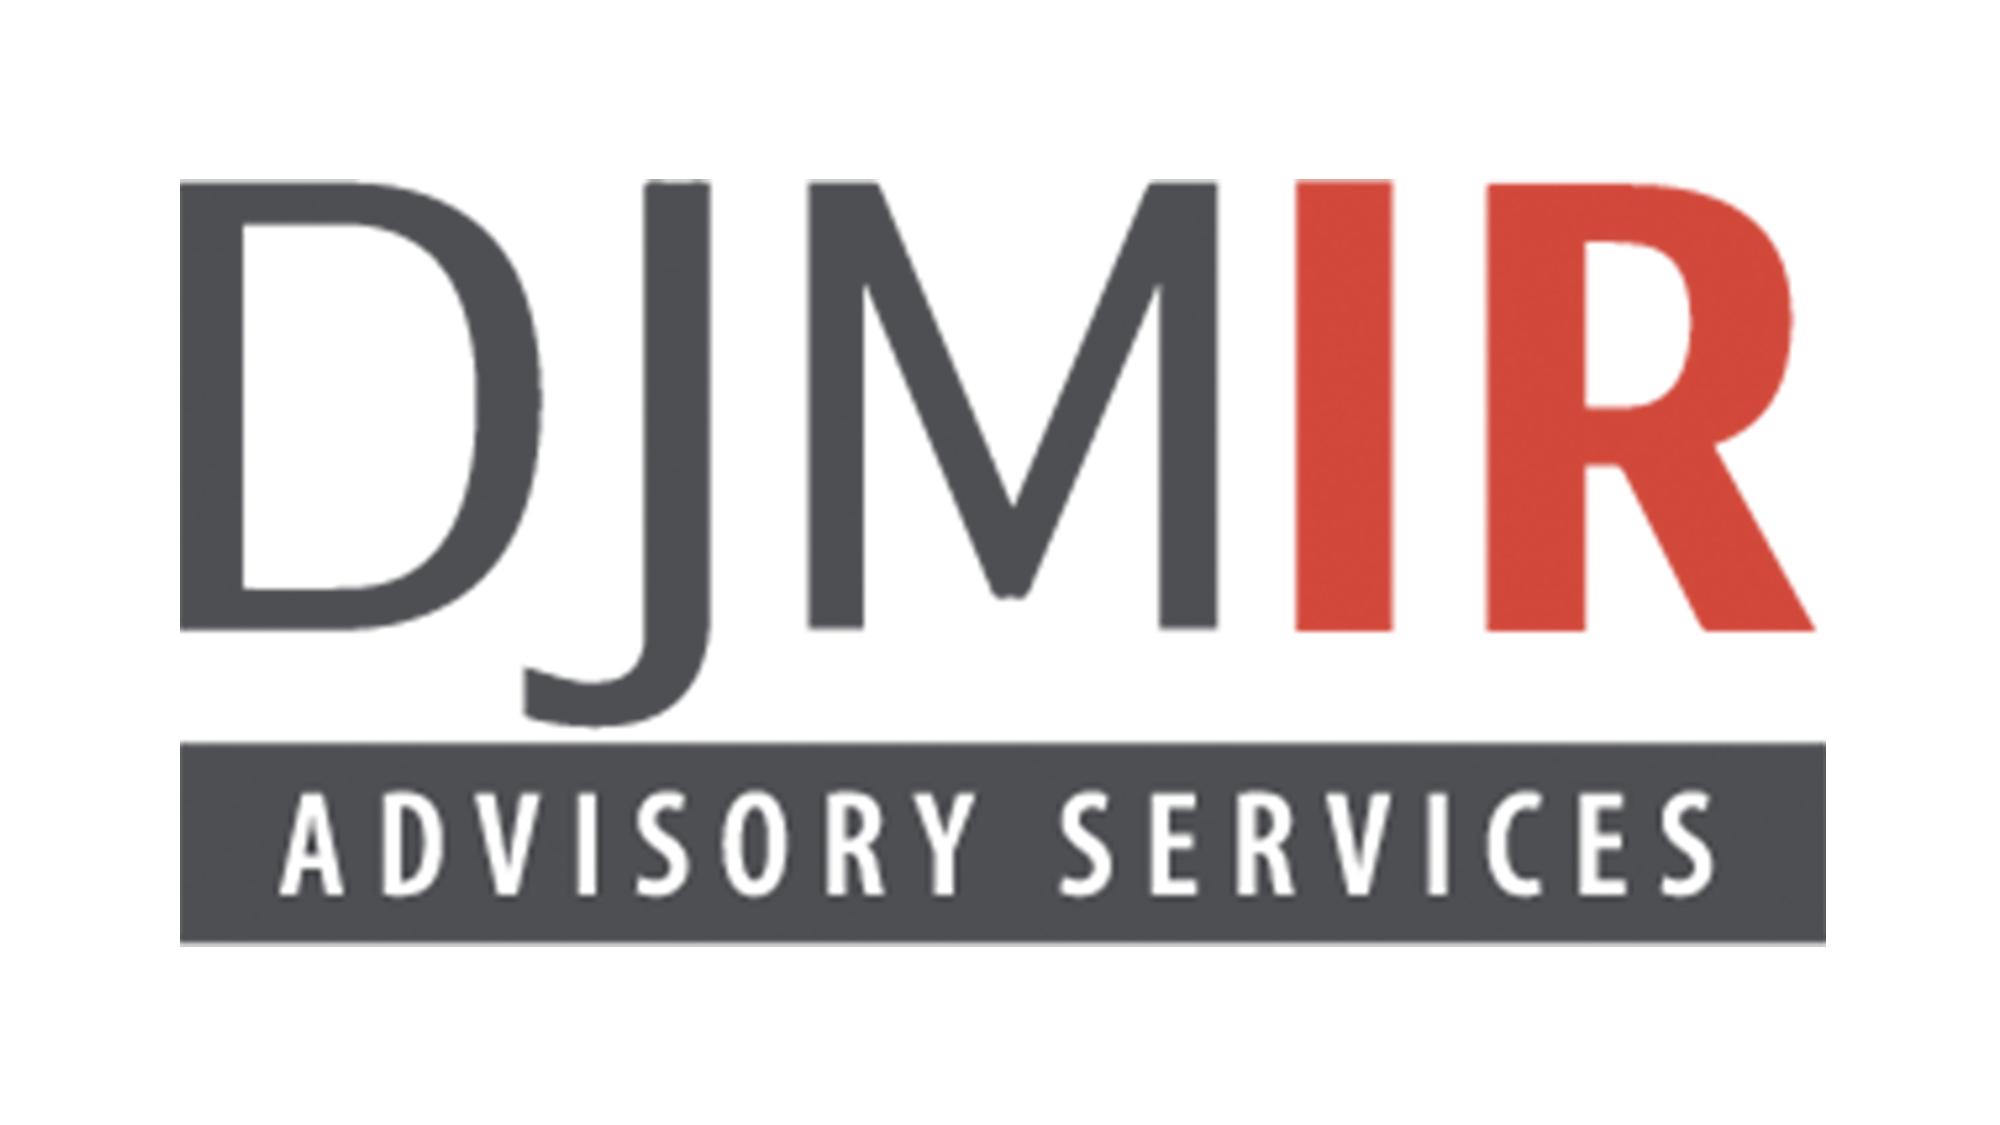 DJMIR Advisory Services logo